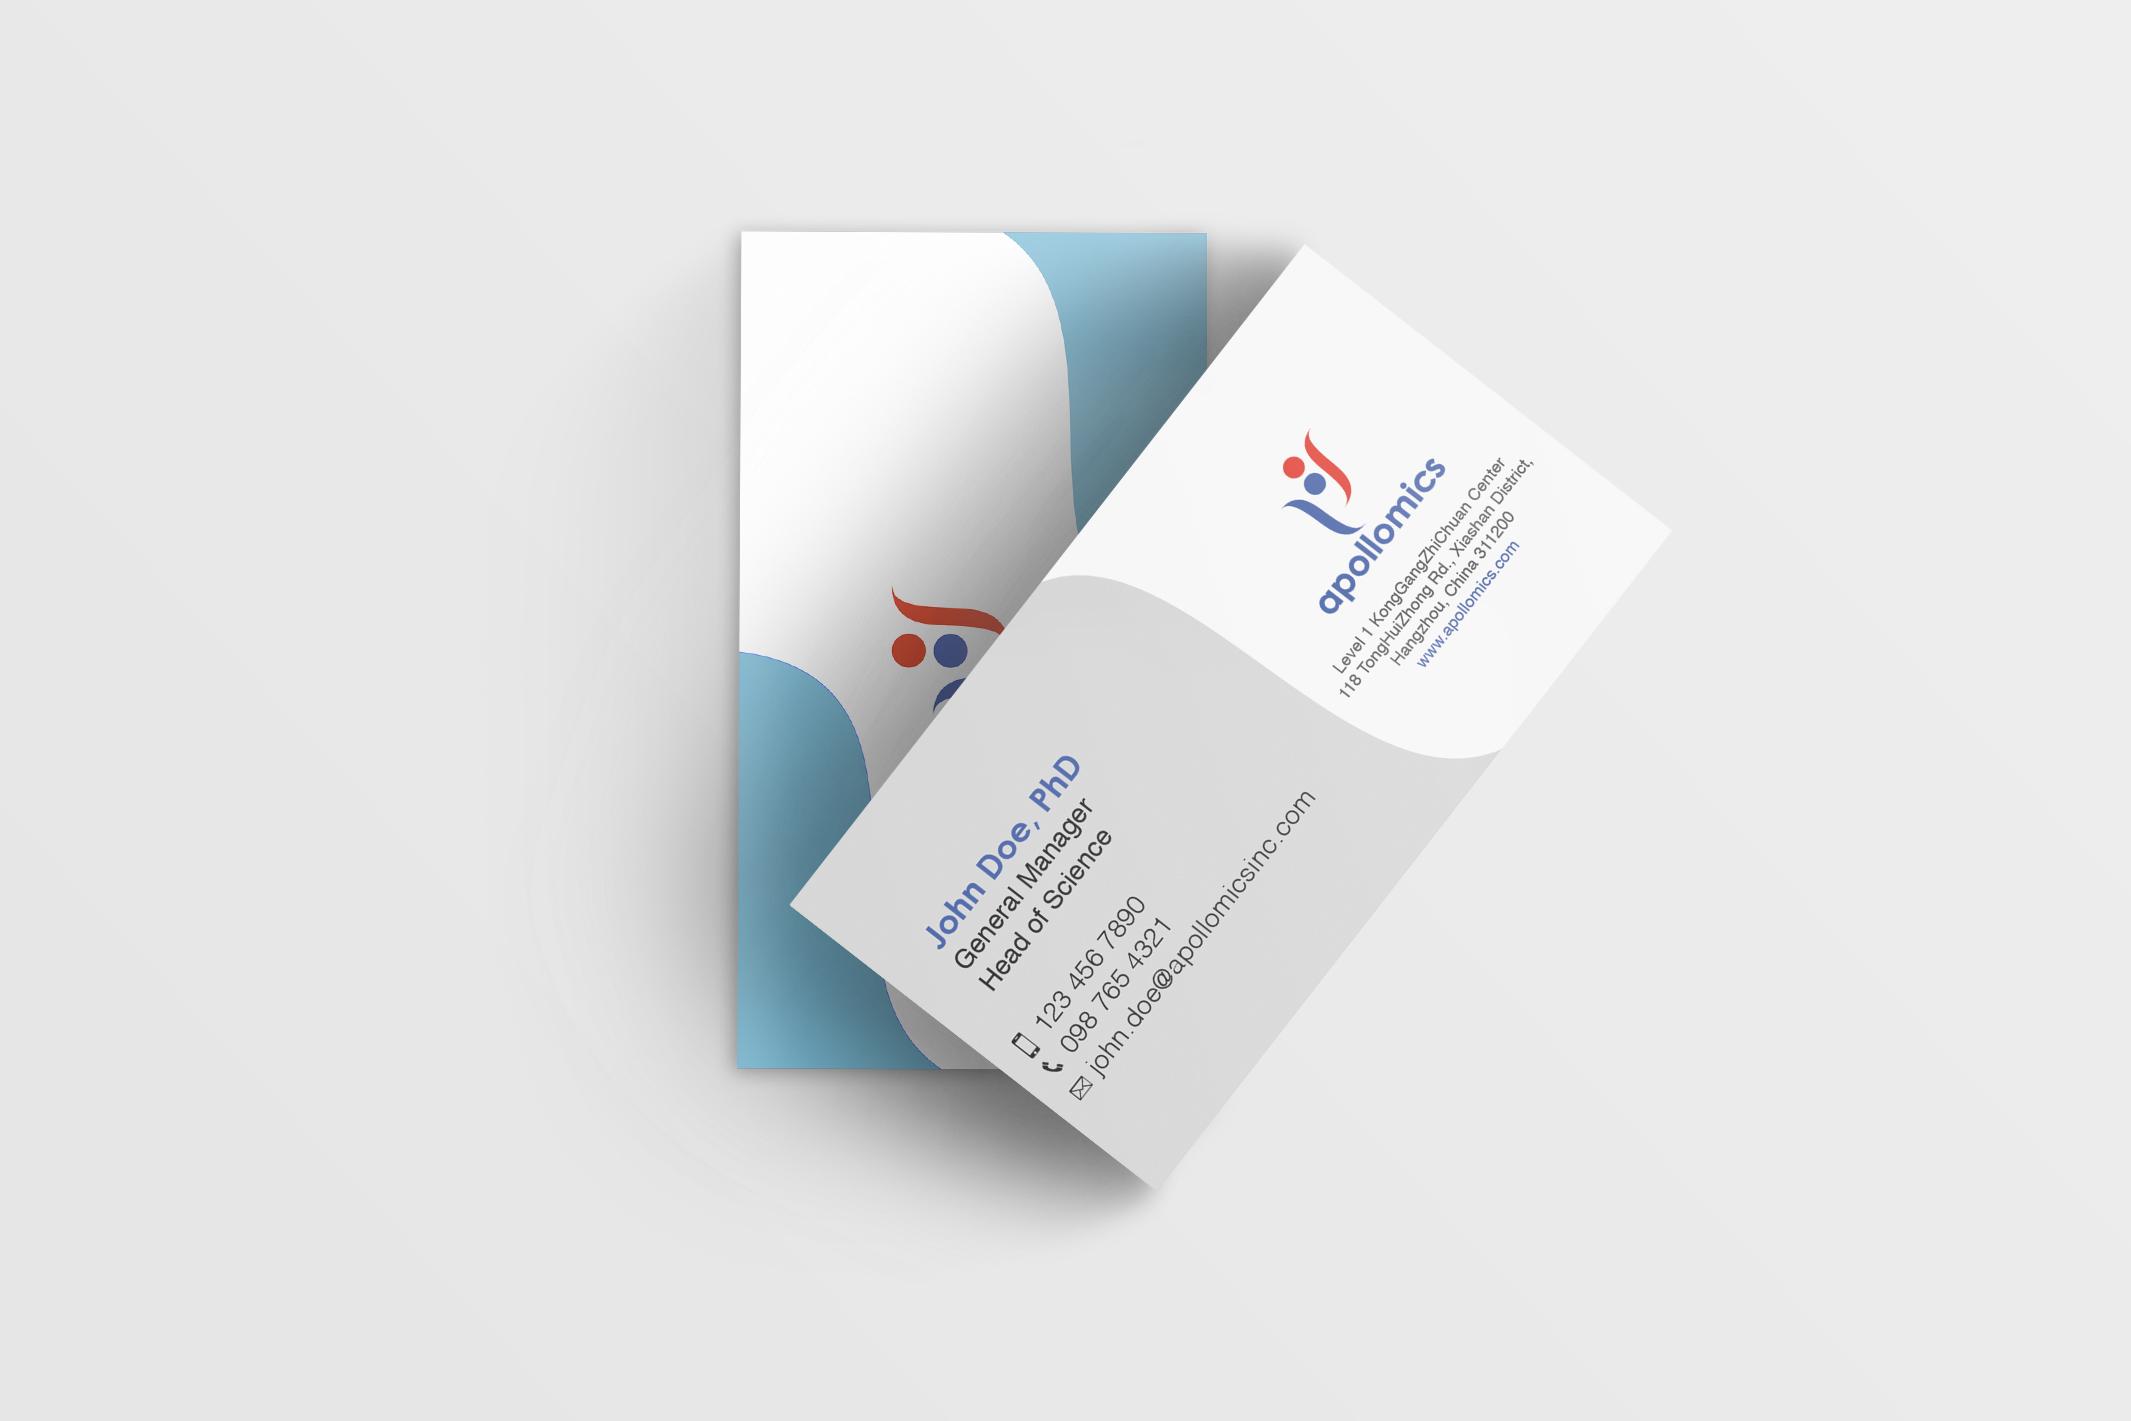 Apollomics_Mockup_businesscard.jpg